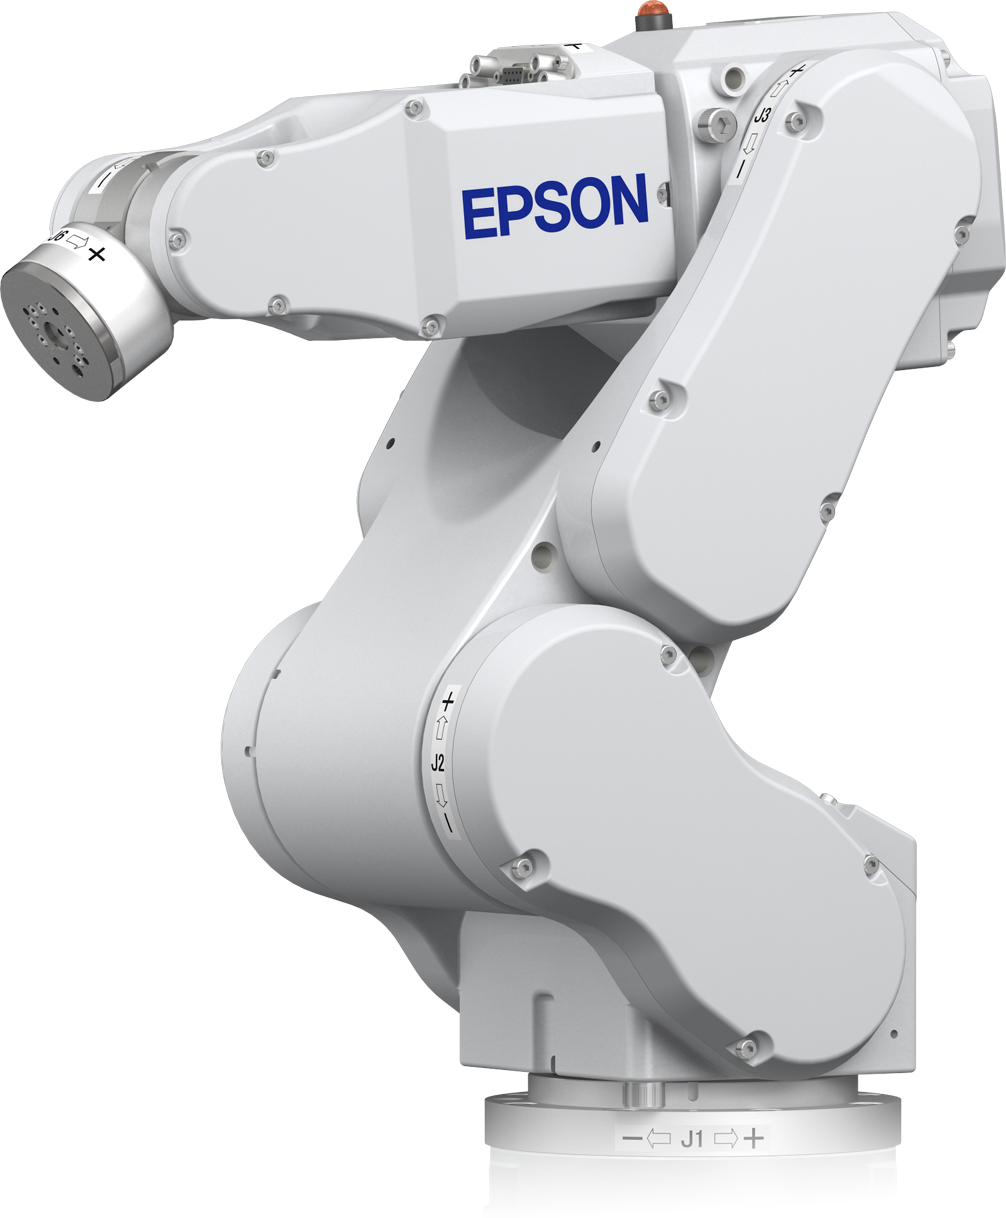 Epson brand robot arm